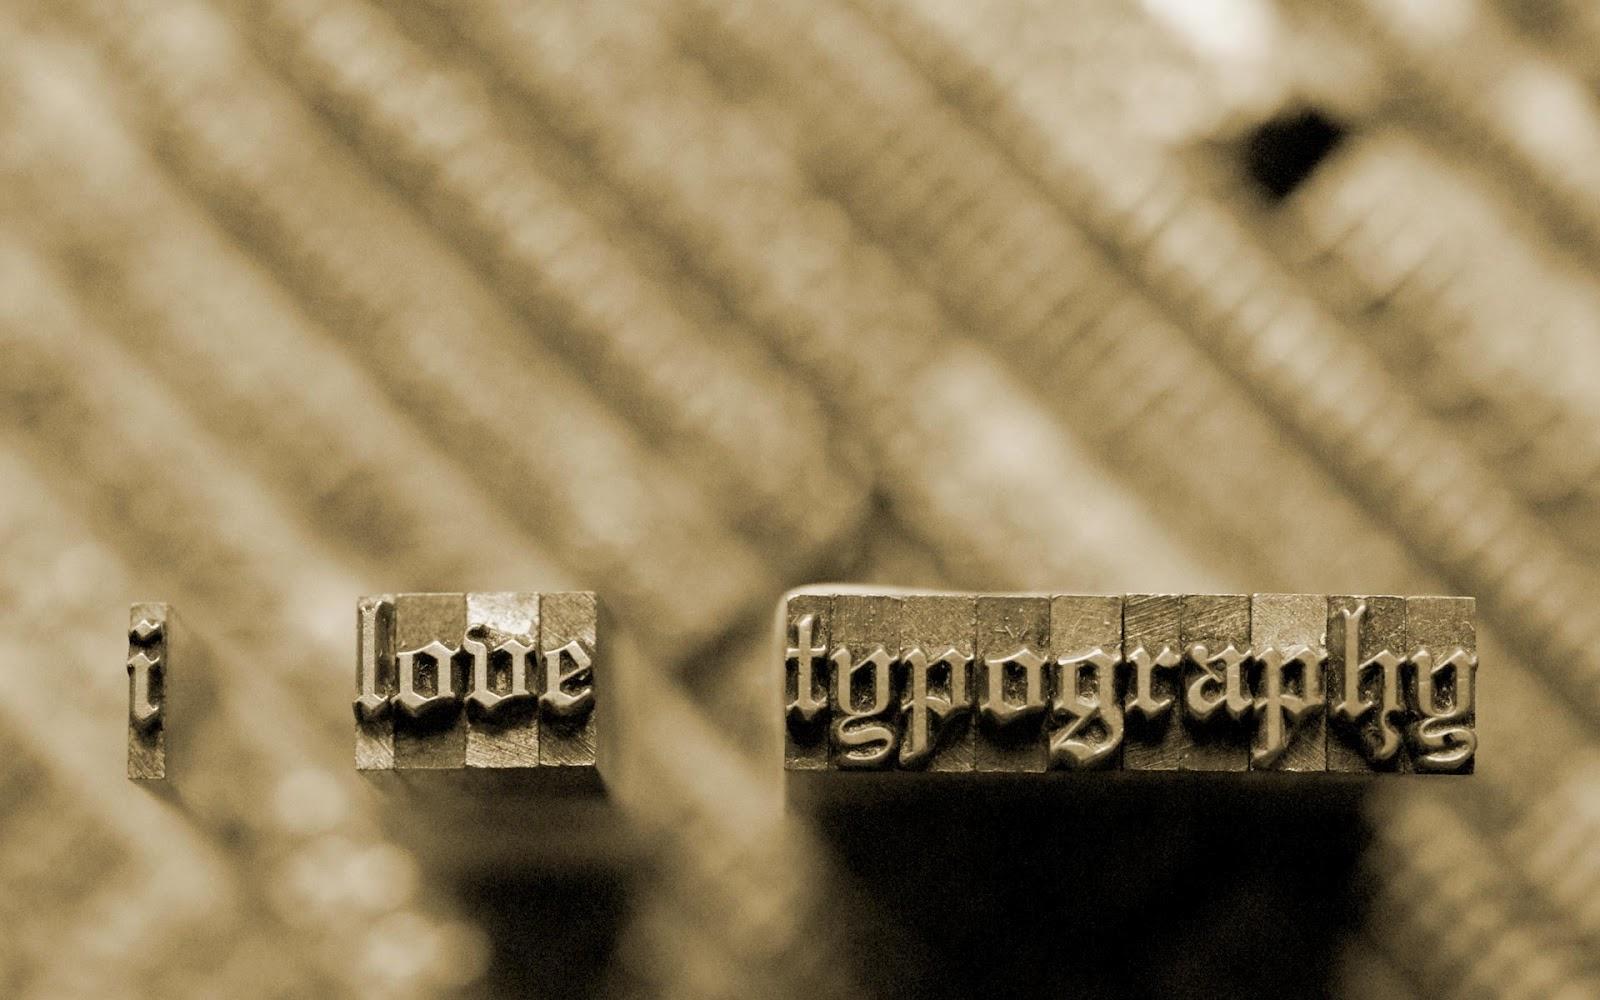 http://2.bp.blogspot.com/-abdEWOZaBCo/T9zWIFeVZNI/AAAAAAAACLI/q03jhlS0zts/s1600/I_Love_Typography_Embossed_Text_HD_Desktop_Wallpaper-HidefWall.Blogspot.Com.Jpg